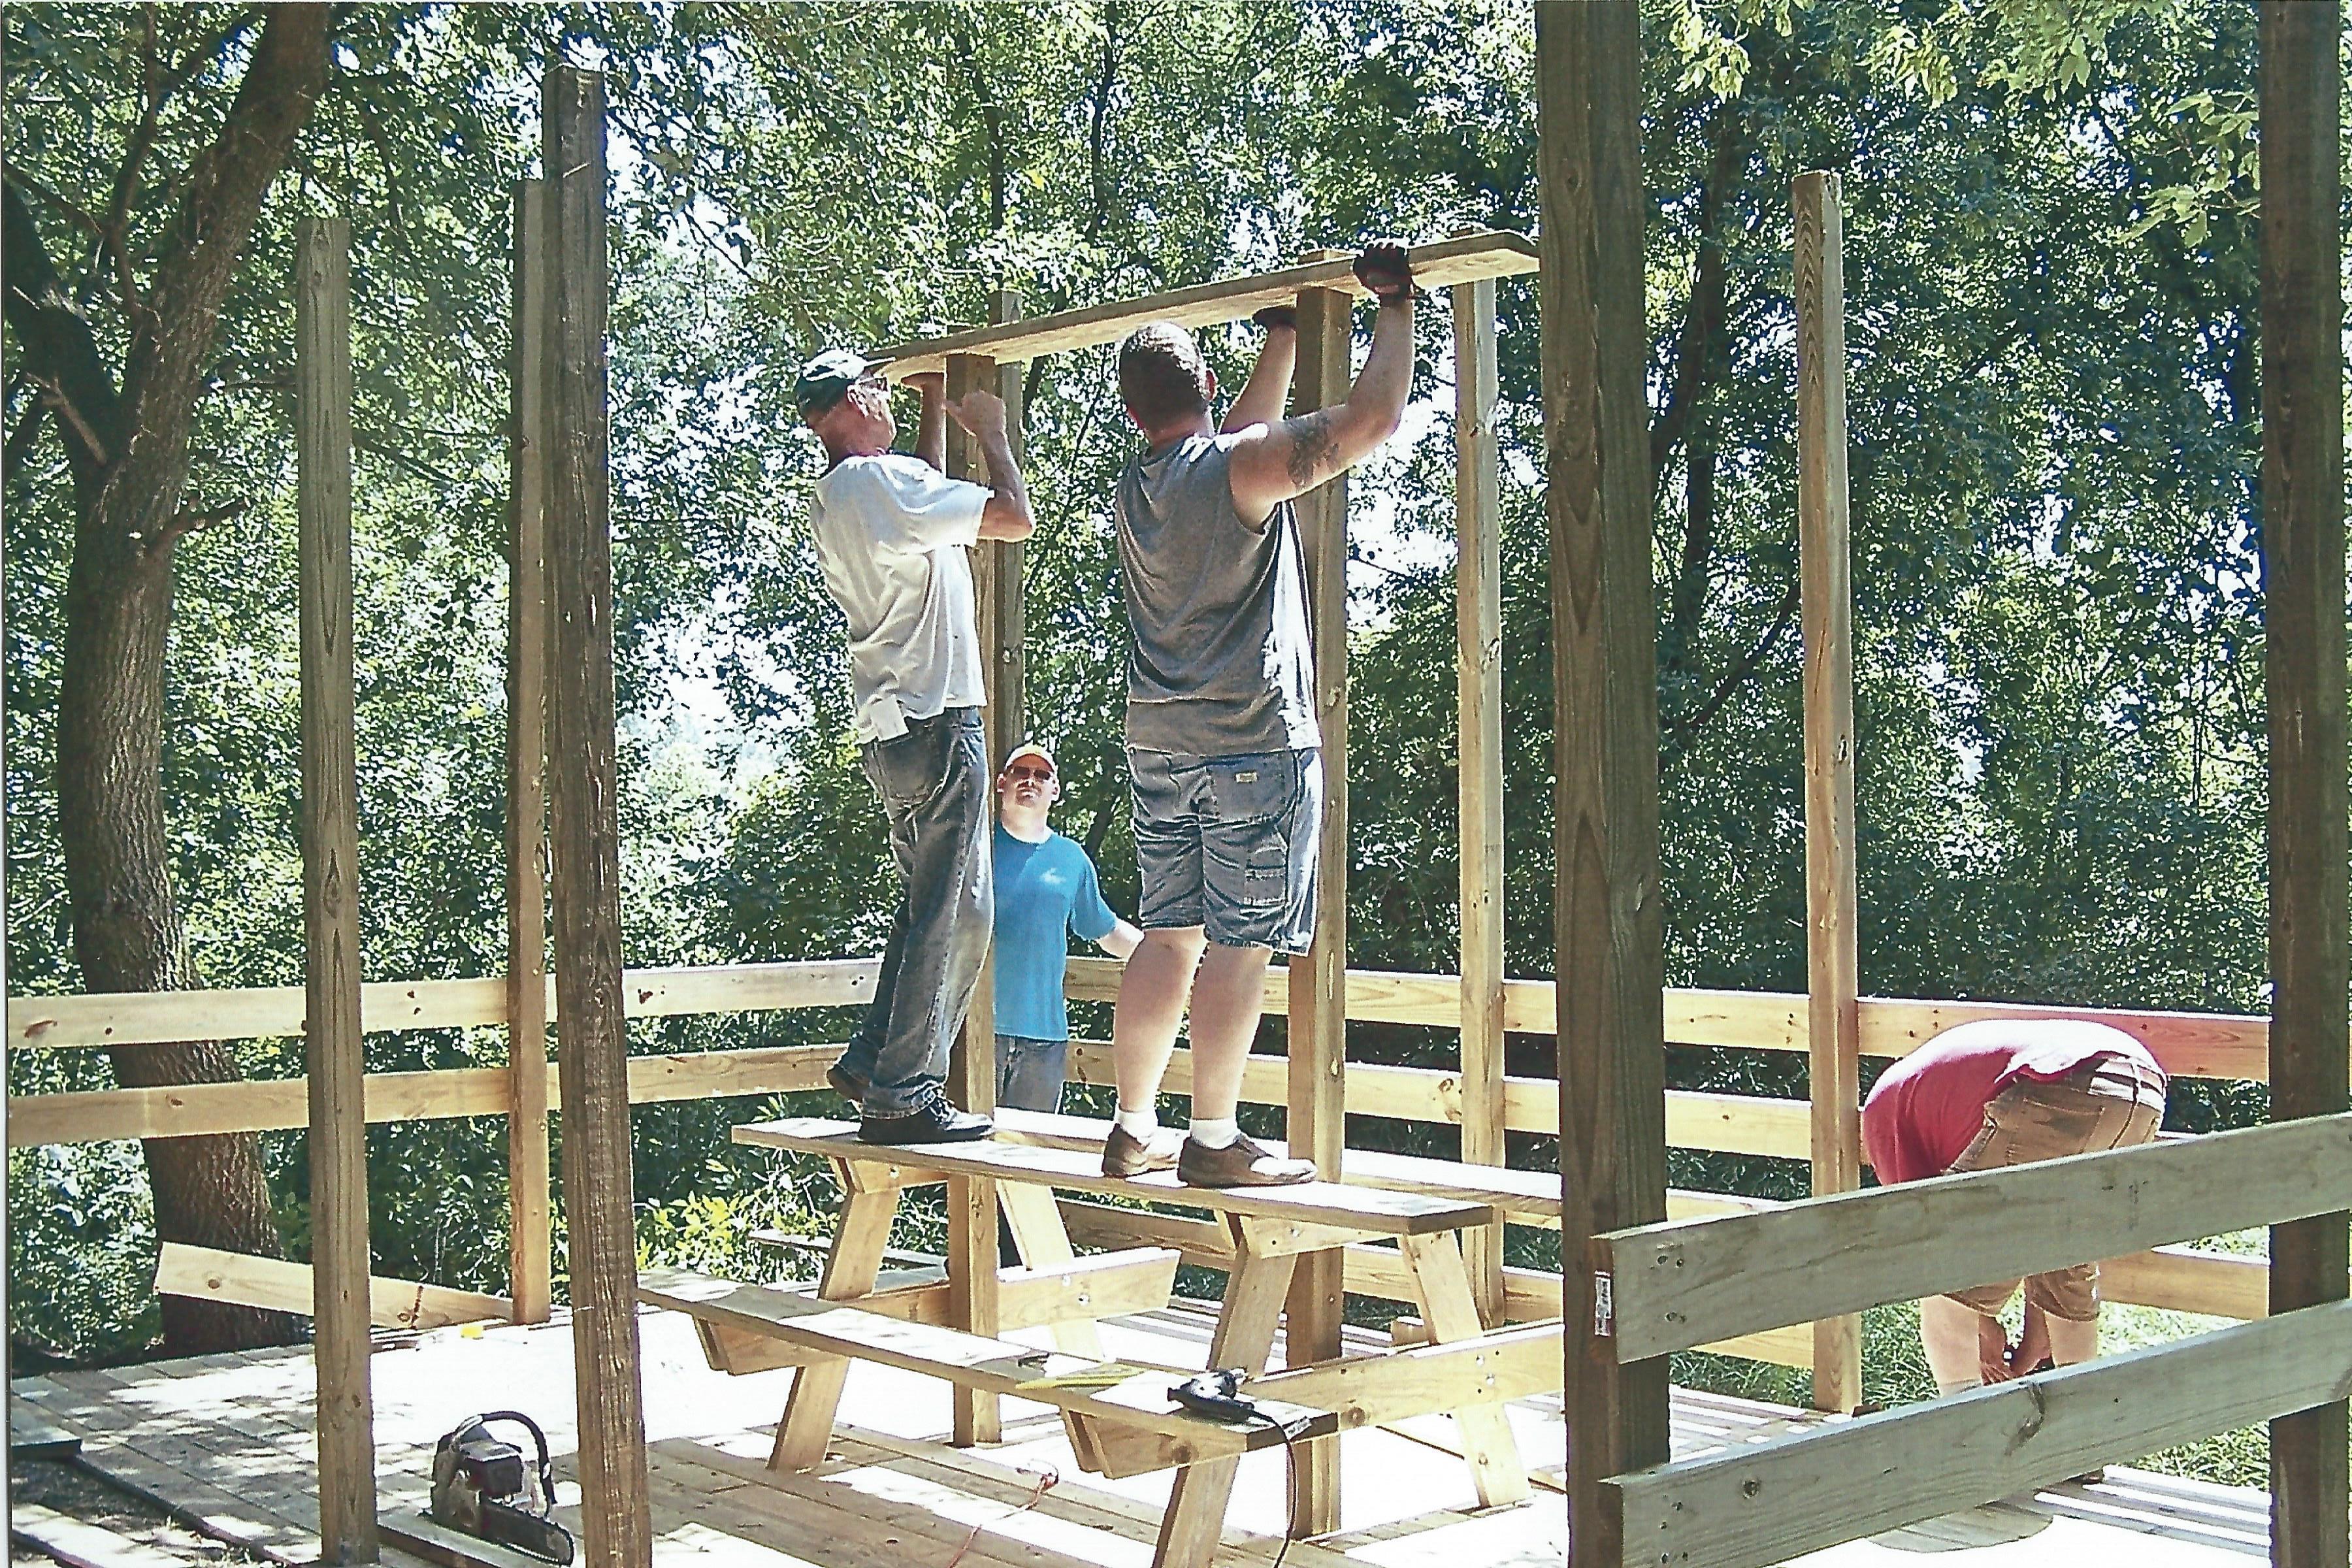 7. Volunteers Constructing Observation Deck - Marne/Conklin